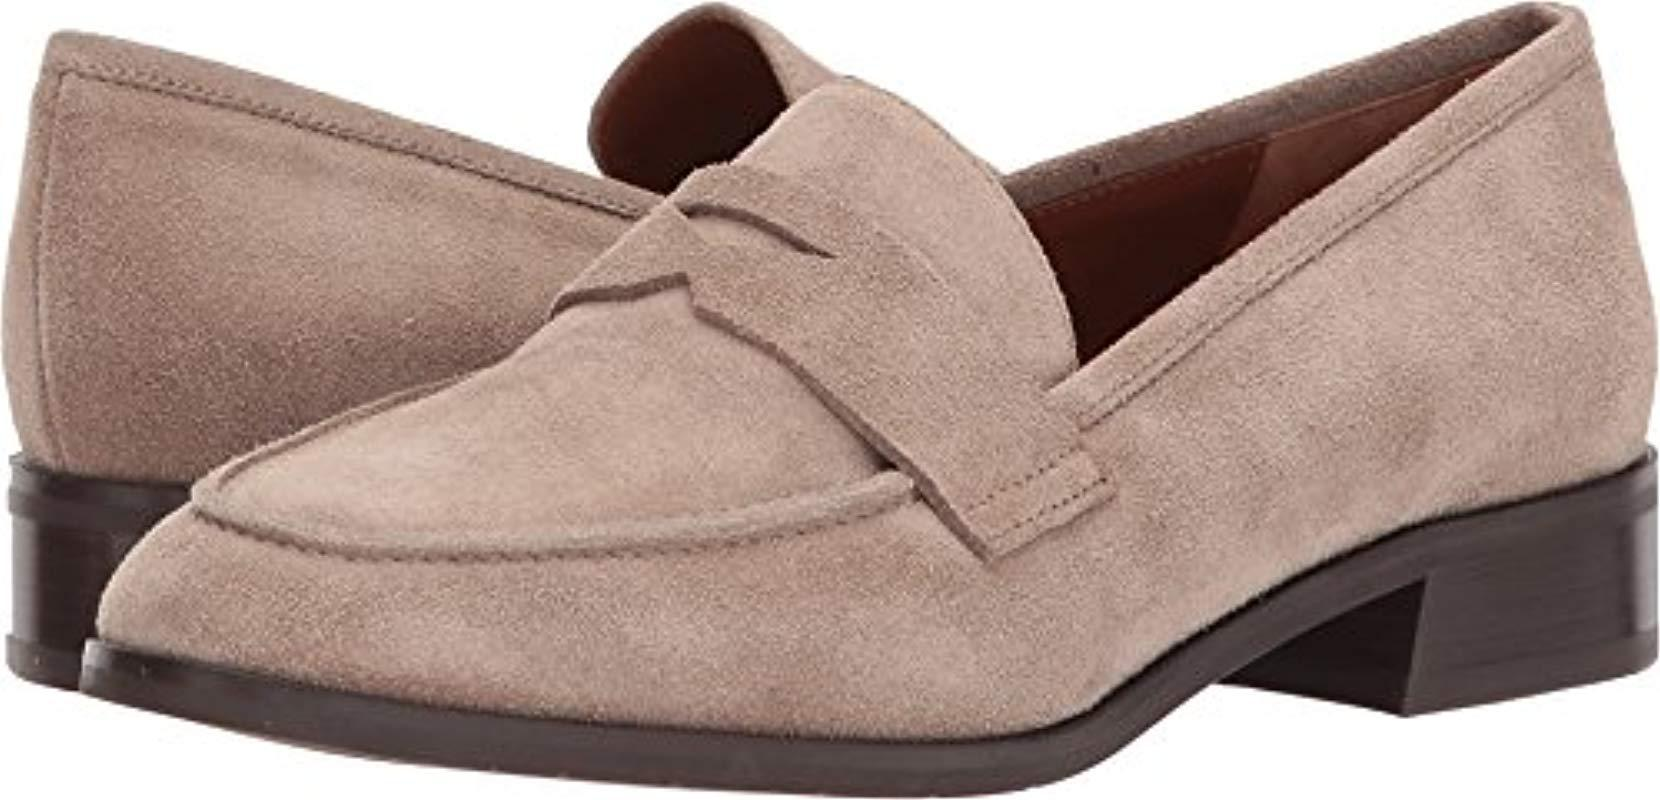 4d8804a09c5 Lyst - Aquatalia Aquatalia Sharon Pebbled Suede Slip-on Loafer in Brown